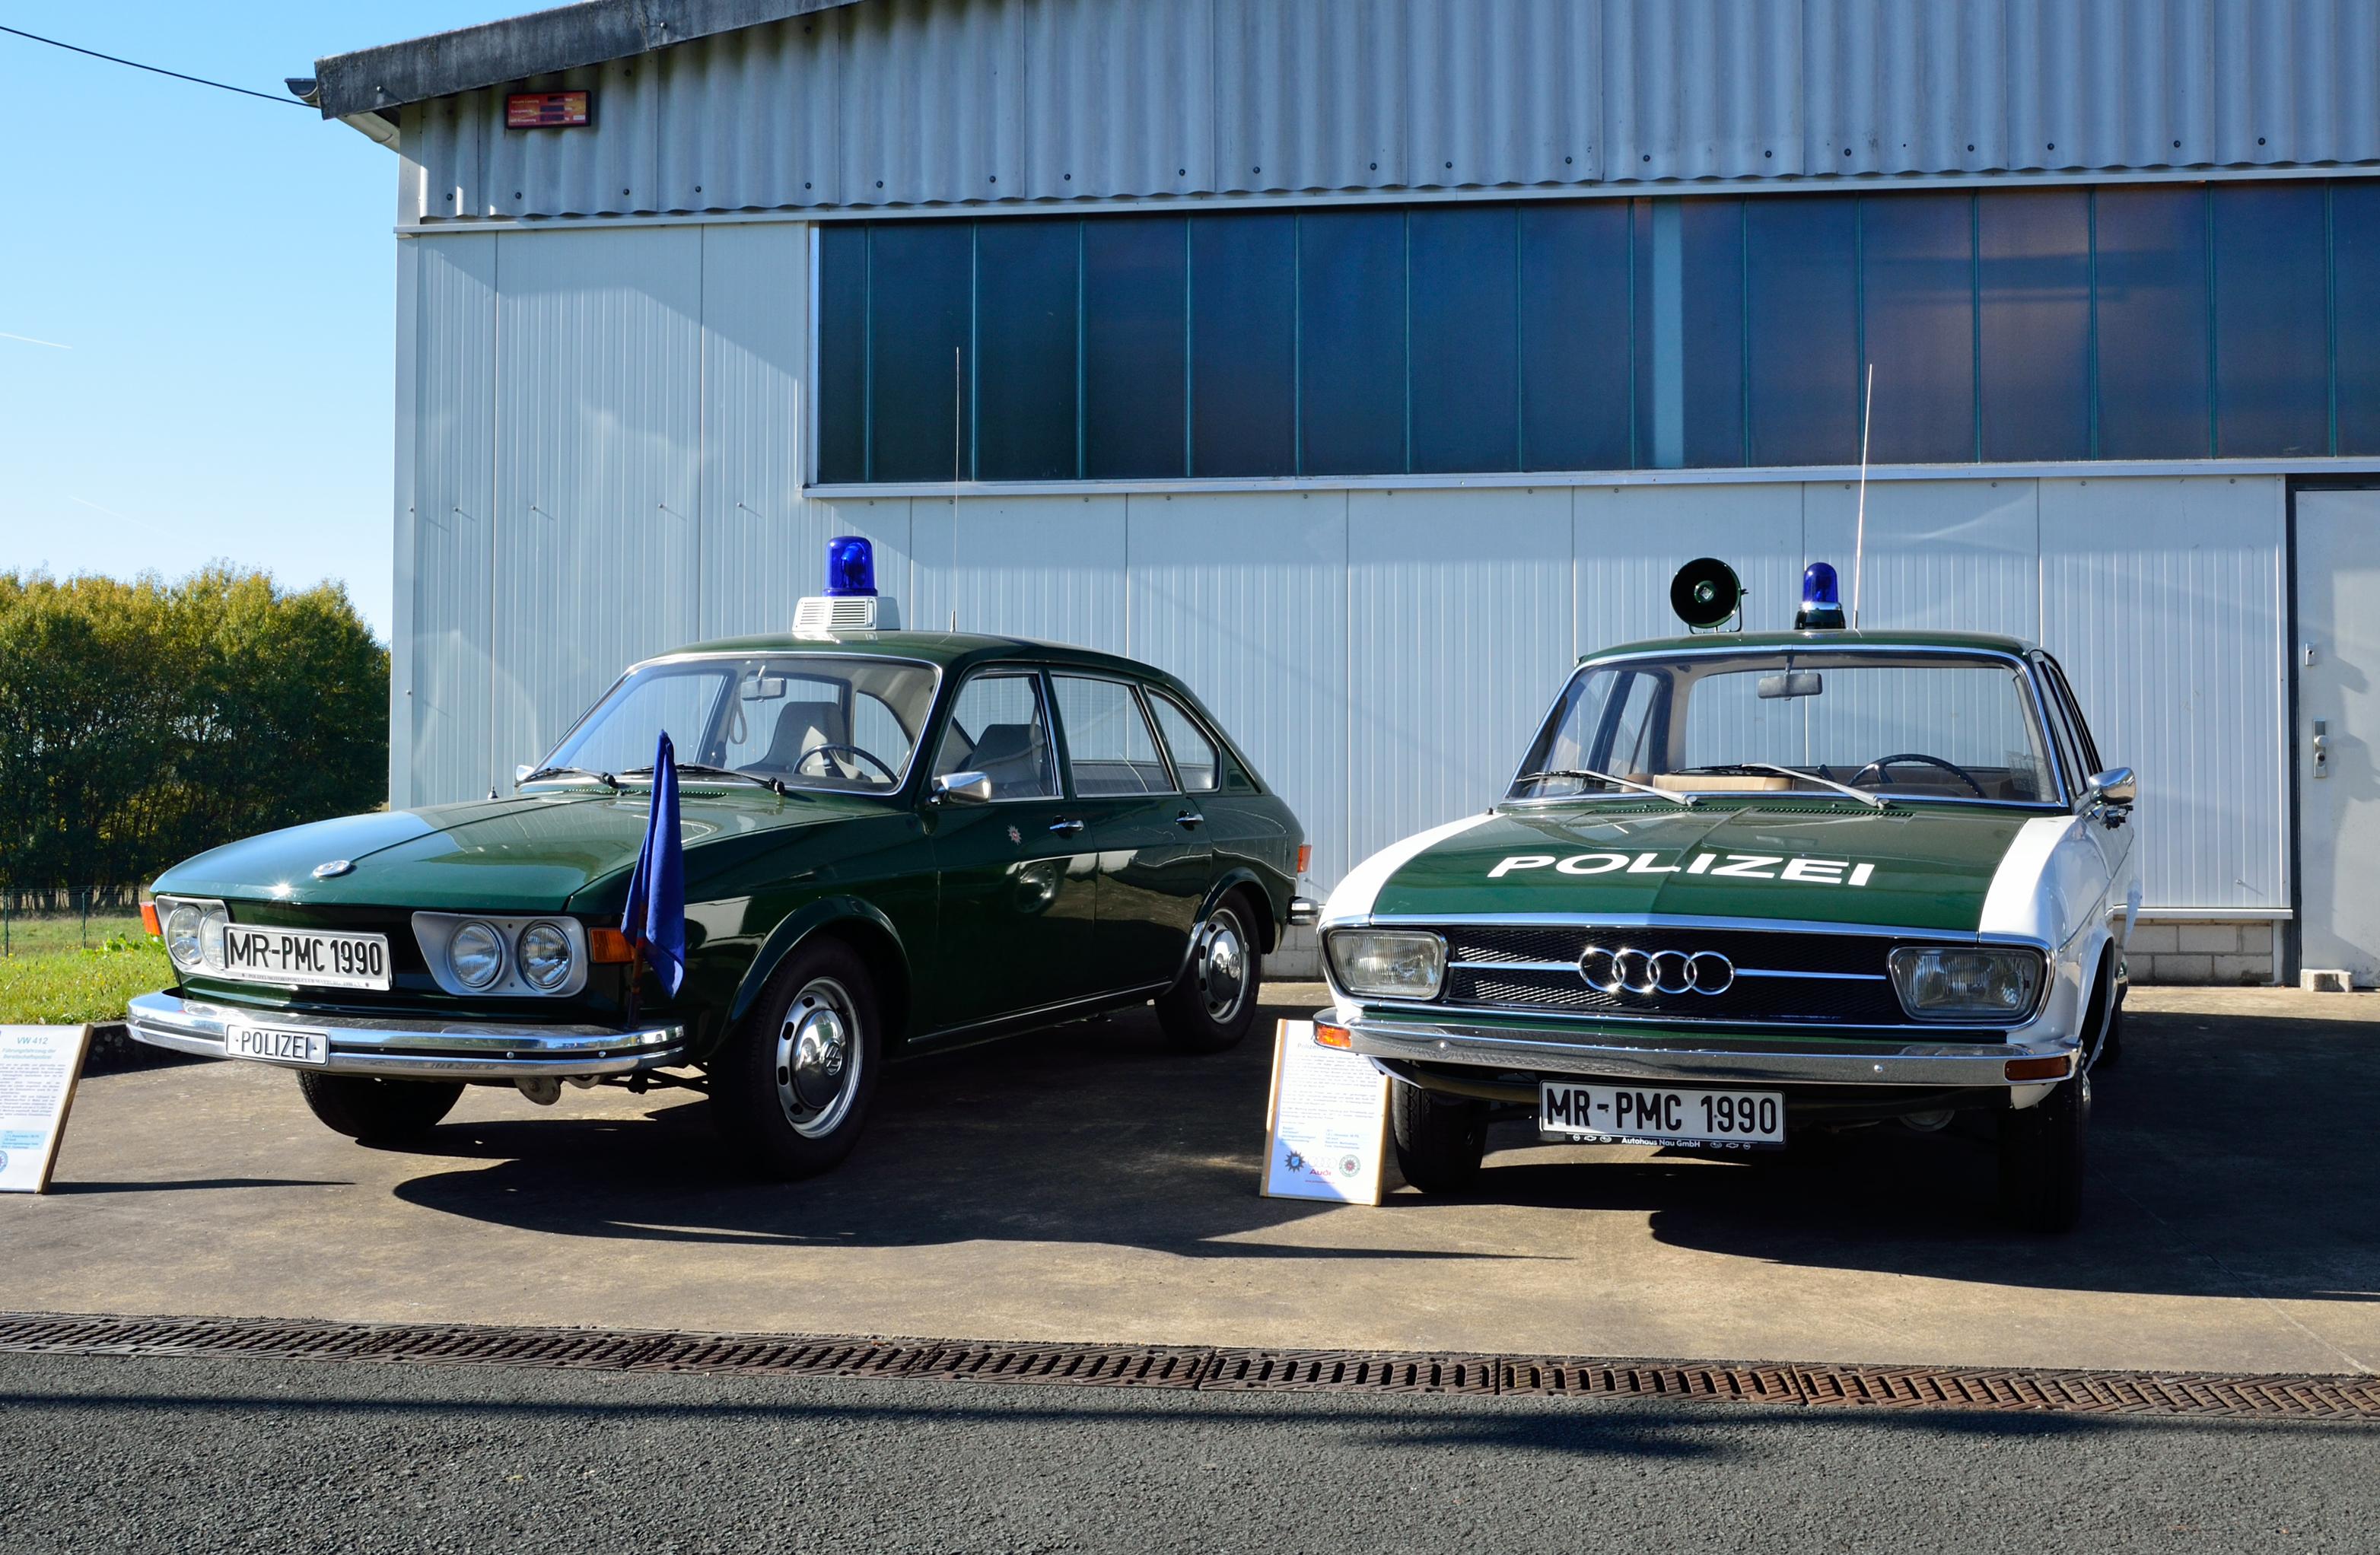 File Polizeioldtimer Vw Und Audi Jpg Wikimedia Commons